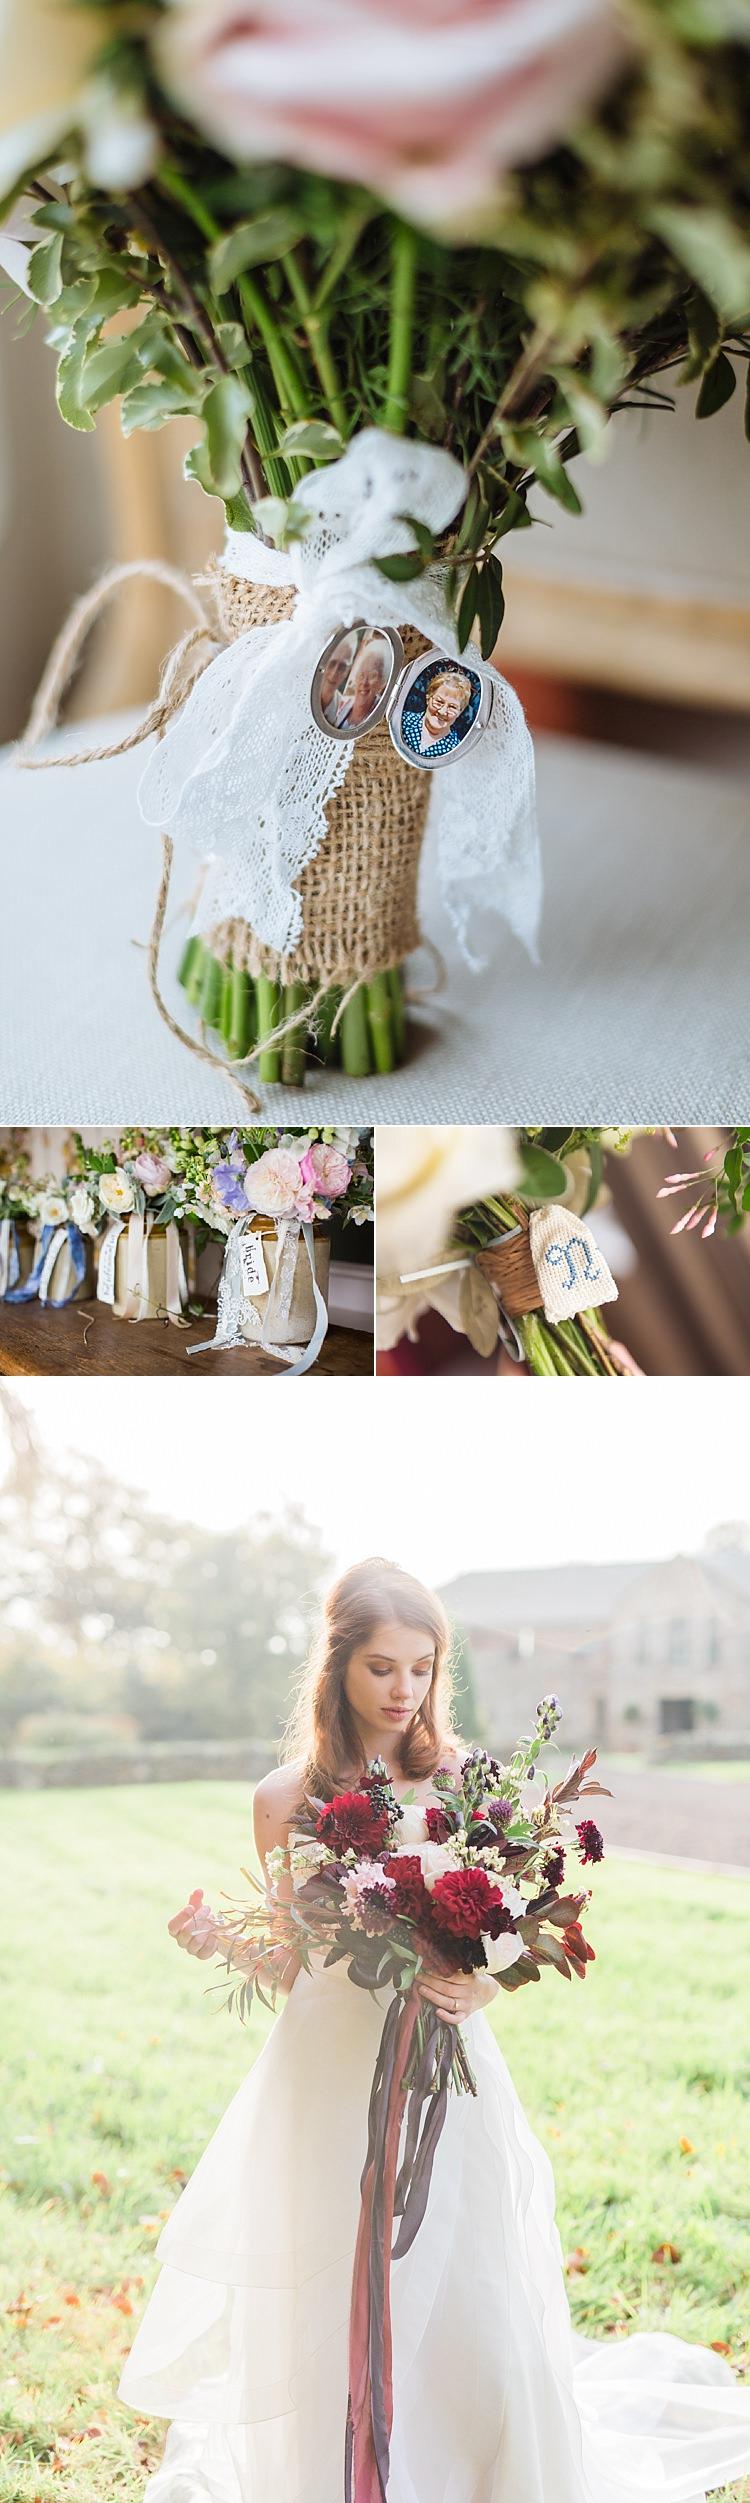 Bridal Accessories 2017 Wedding Flower Trends Bouquets Ideas Inspiration